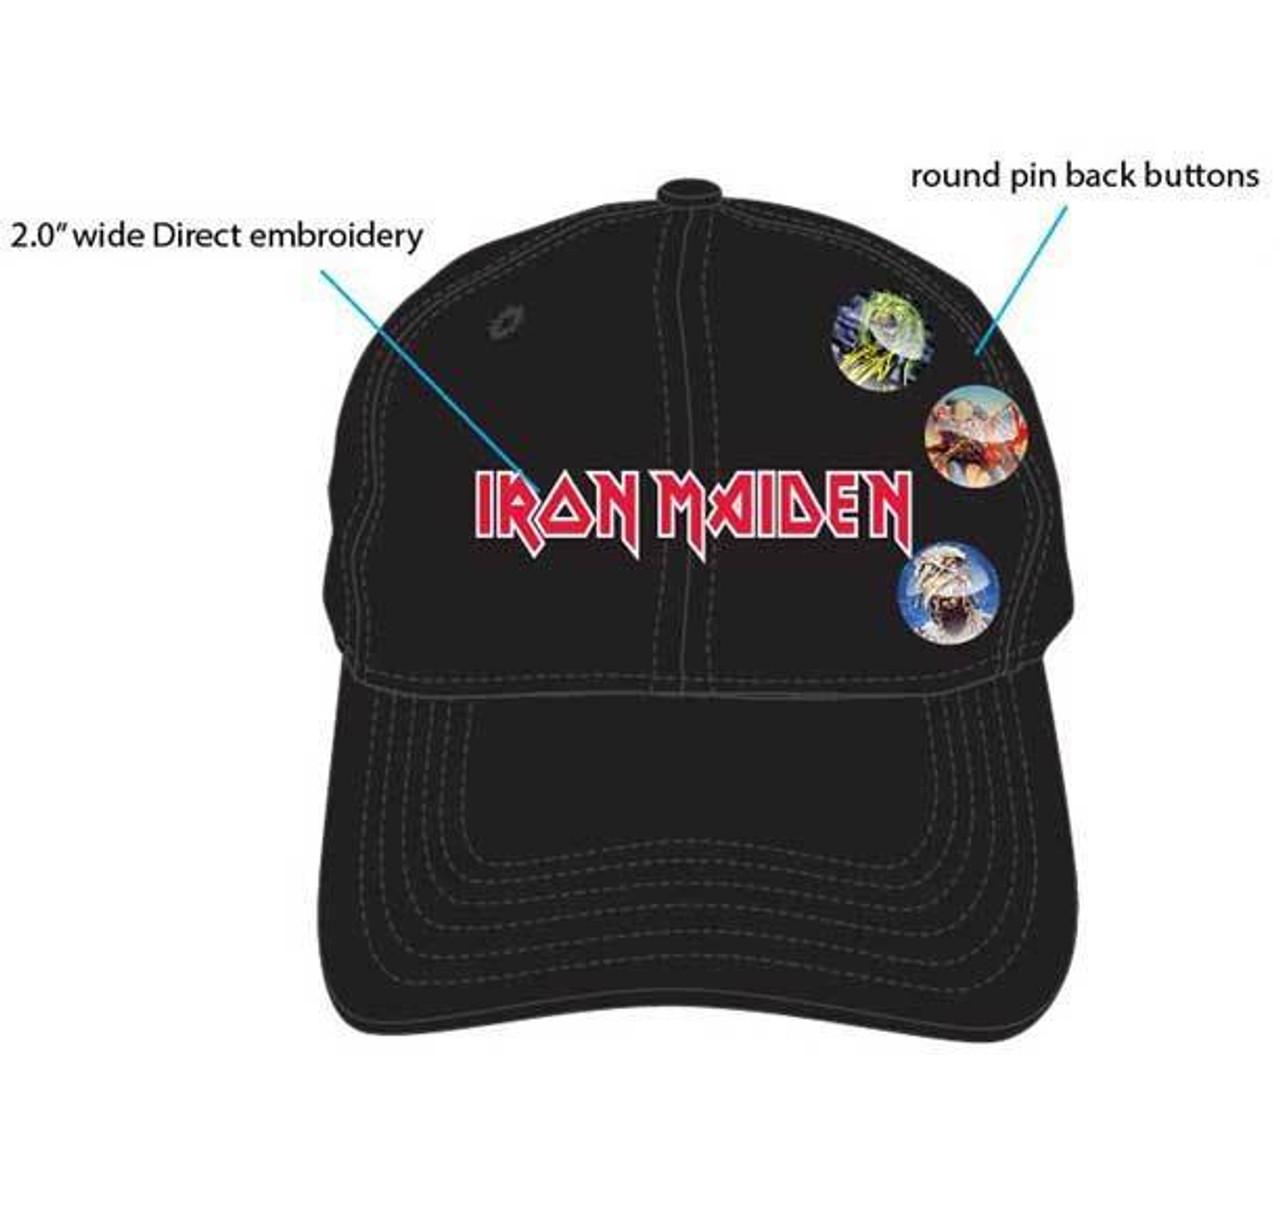 H3 Sportgear Iron Maiden Button Pin Adjustable Baseball Cap Dad Hat  BA00455IMDU - Fearless Apparel ecd9f5a8c47